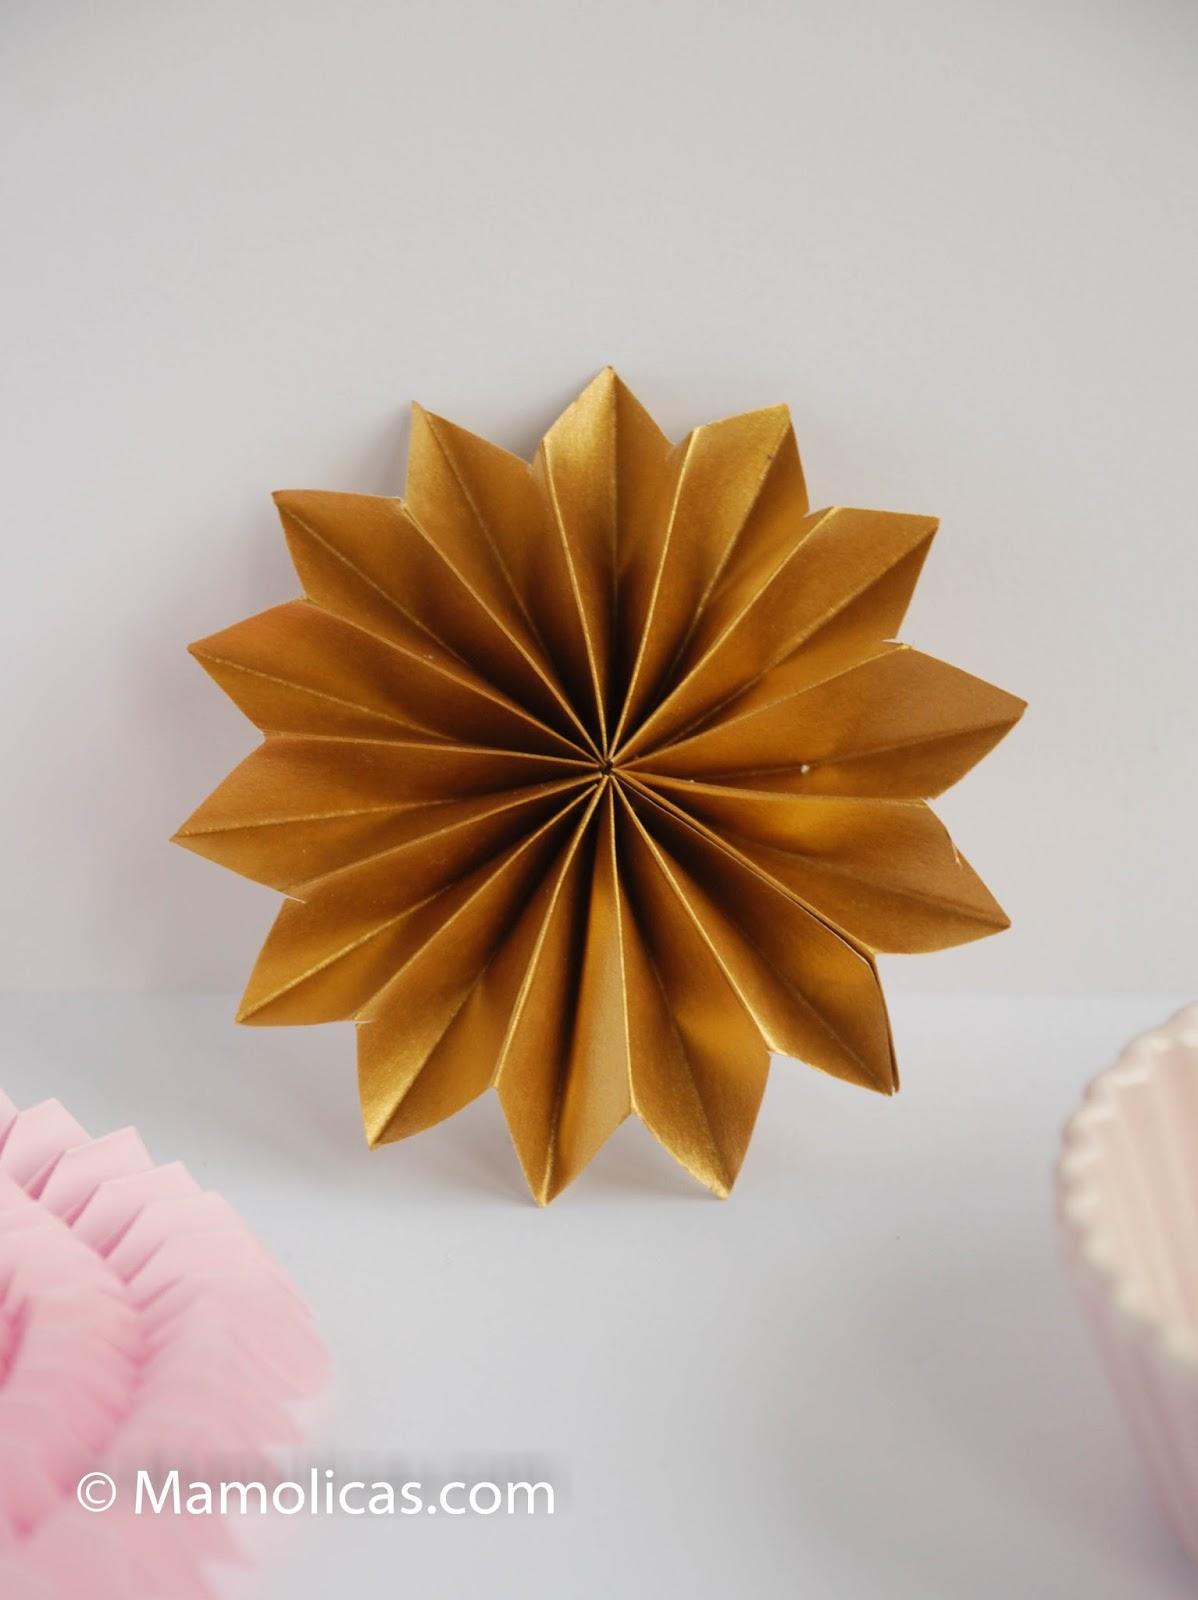 Mamolicas adornos navidad con papel plegado for Adornos navidenos de papel